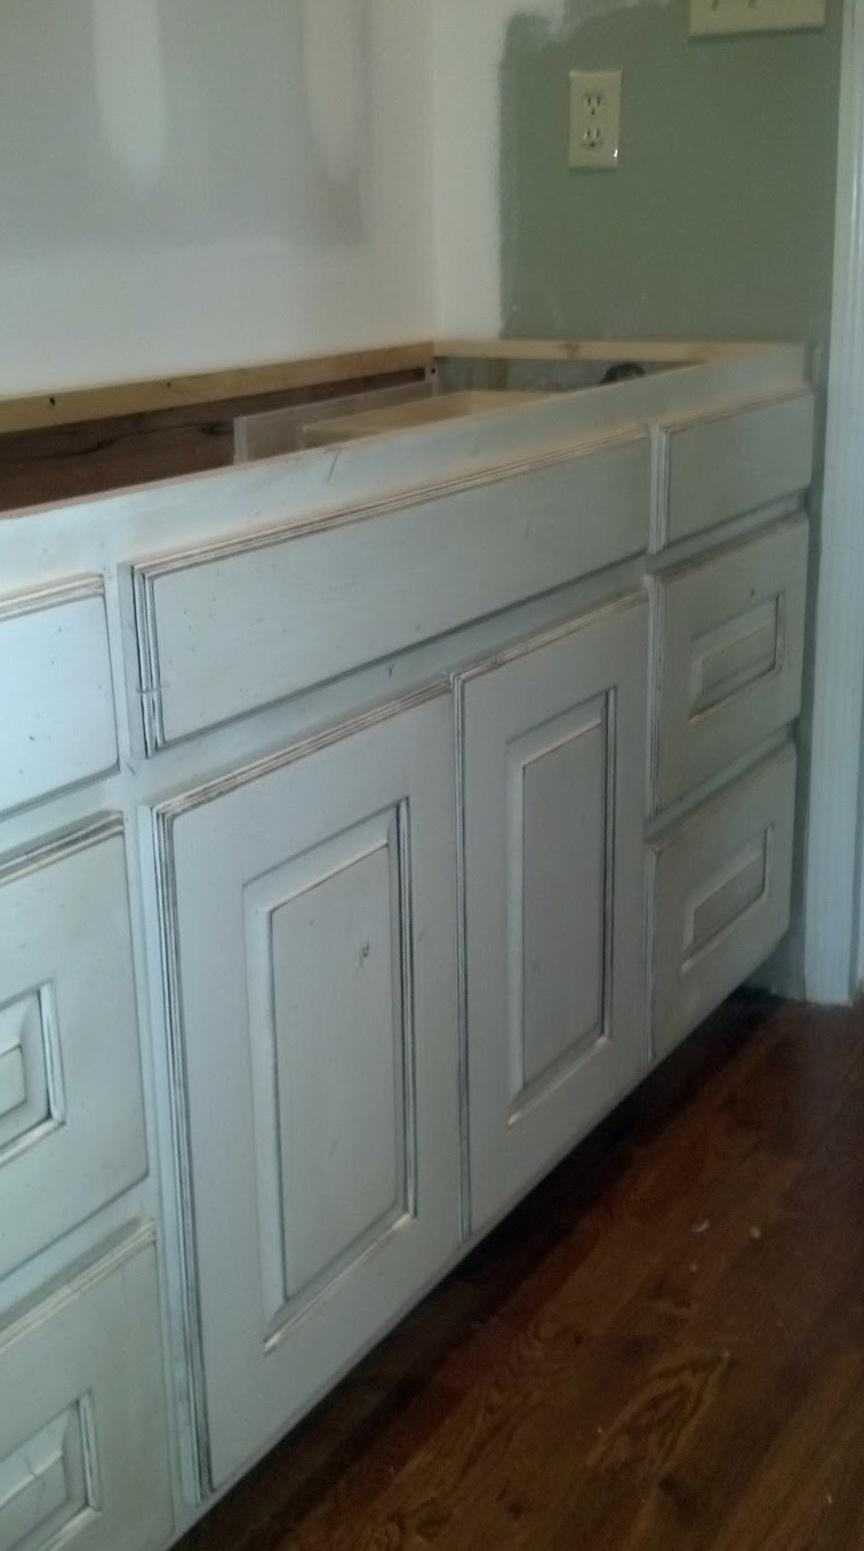 White Knotty Alder Cabinets